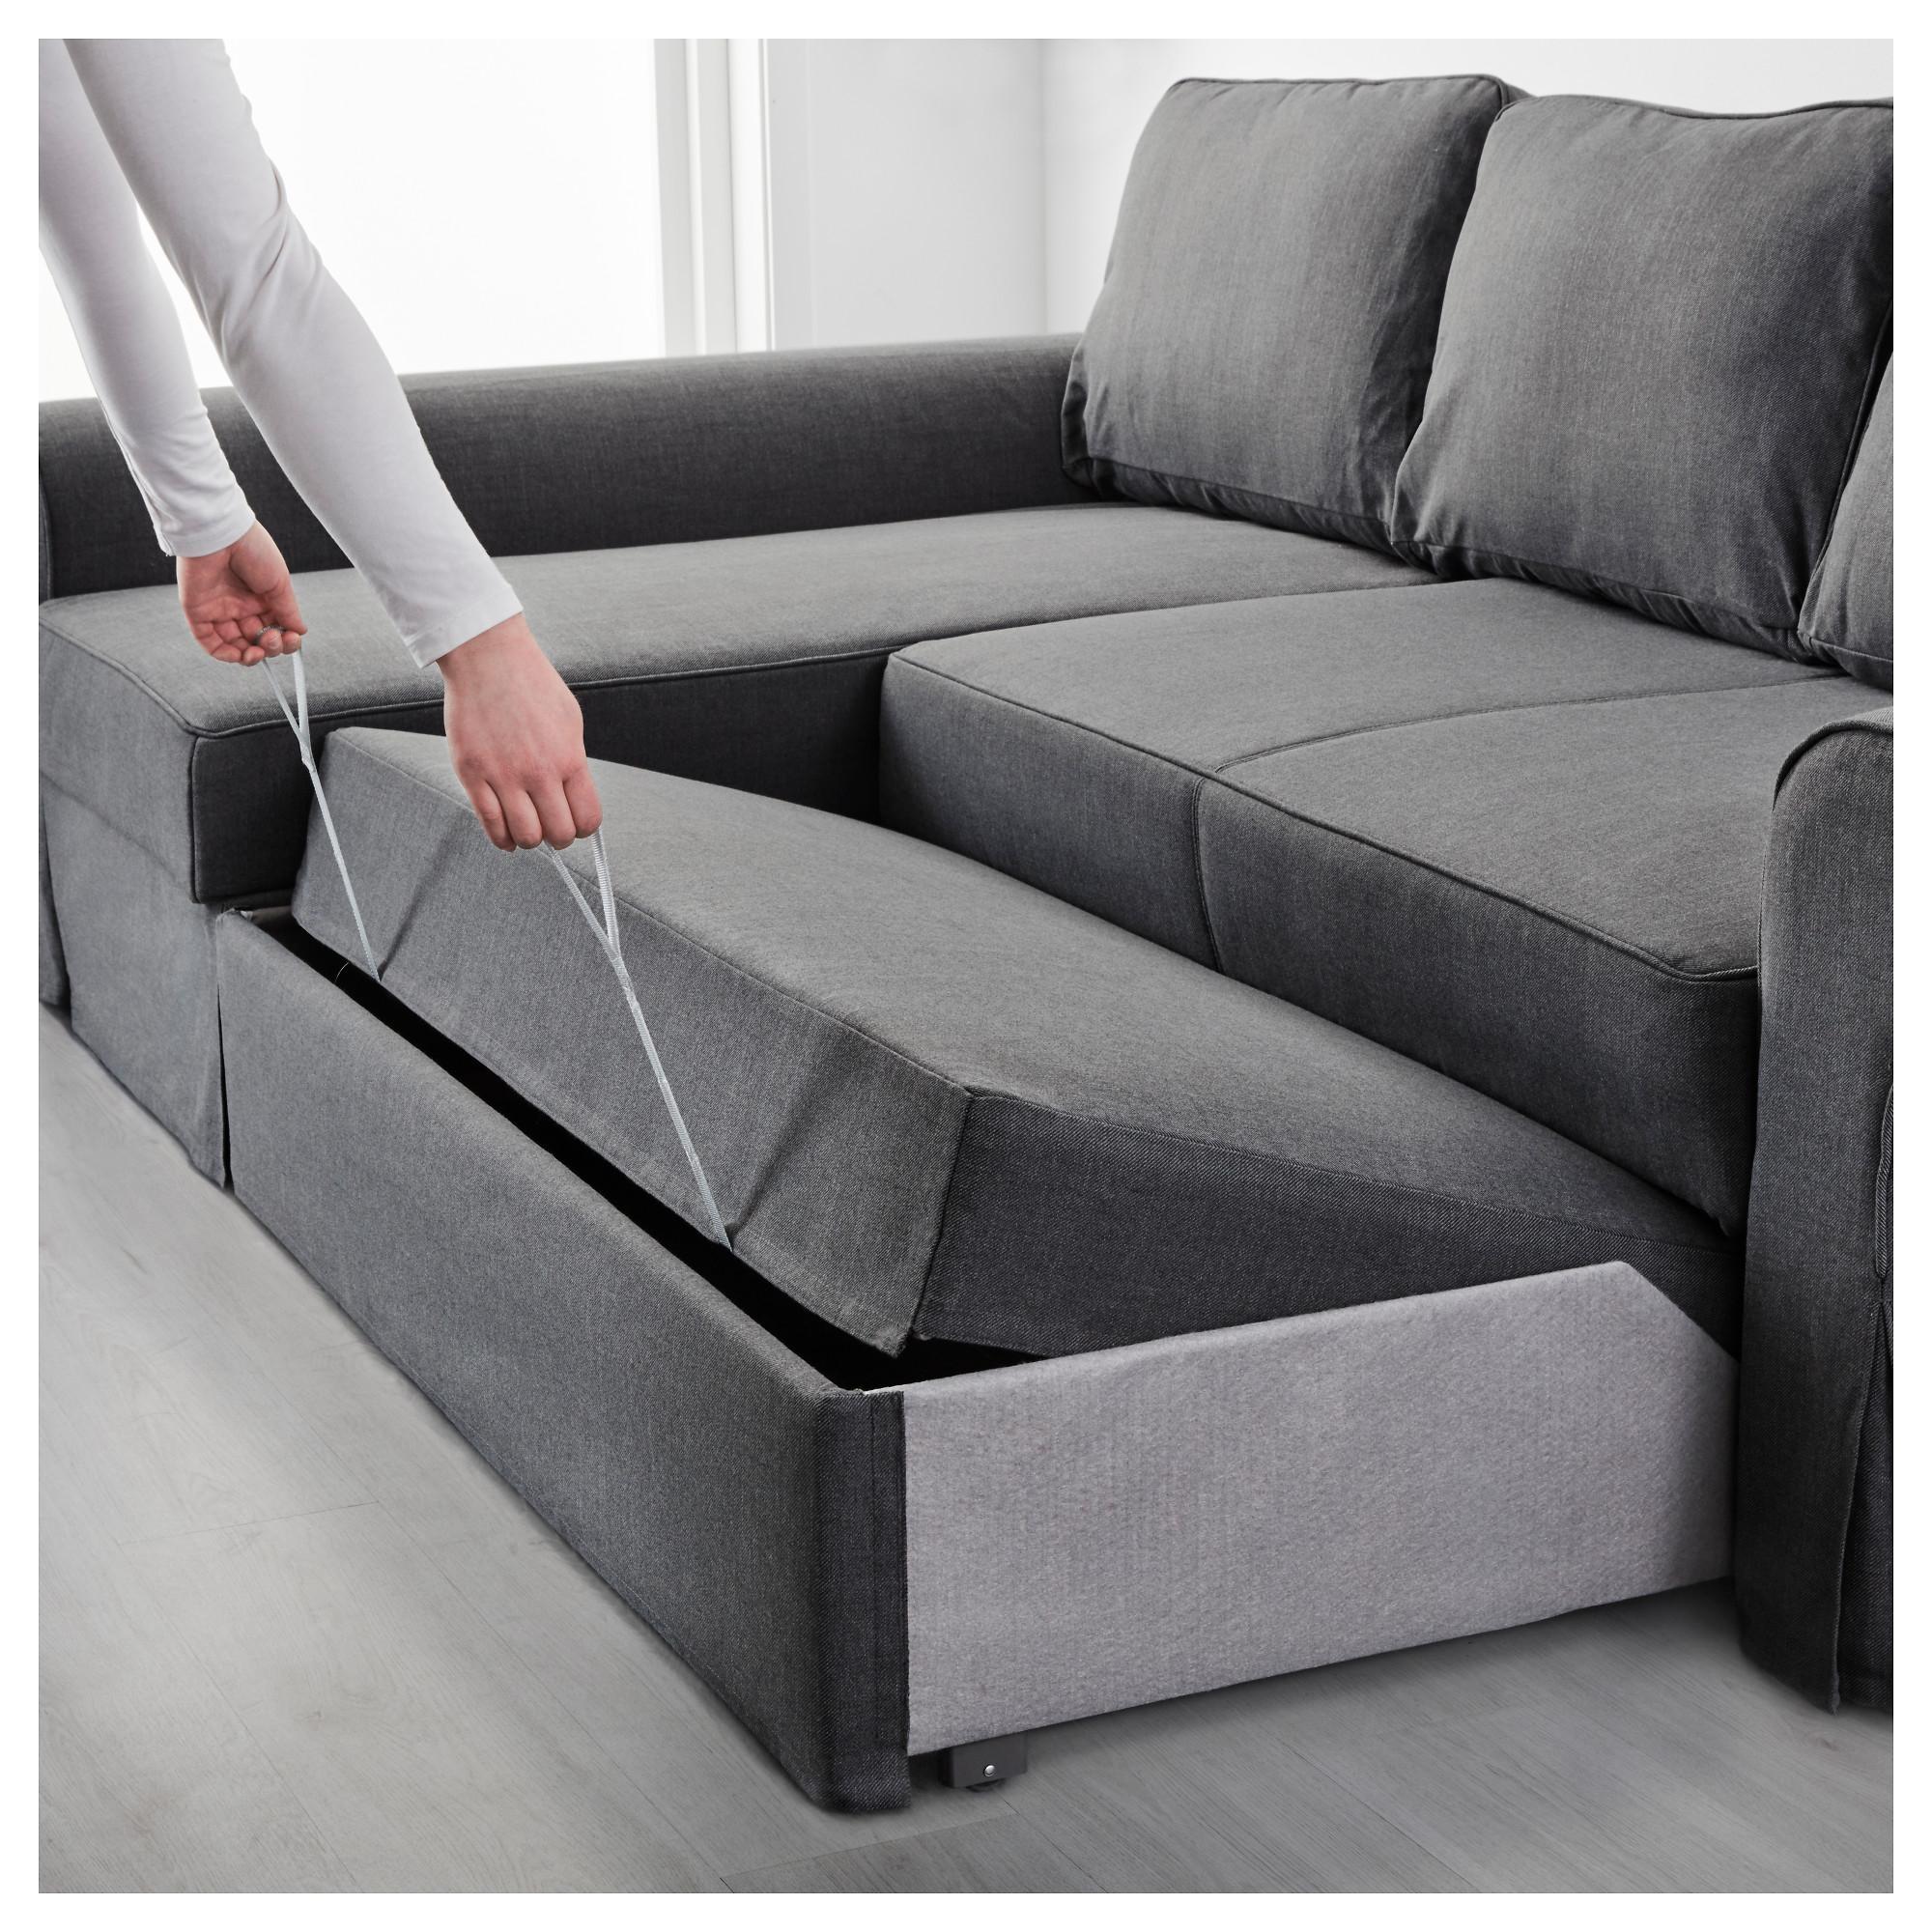 Backabro Sofa Bed With Chaise Longue Nordvalla Dark Grey – Ikea With Sofa Beds With Chaise Lounge (Image 2 of 20)